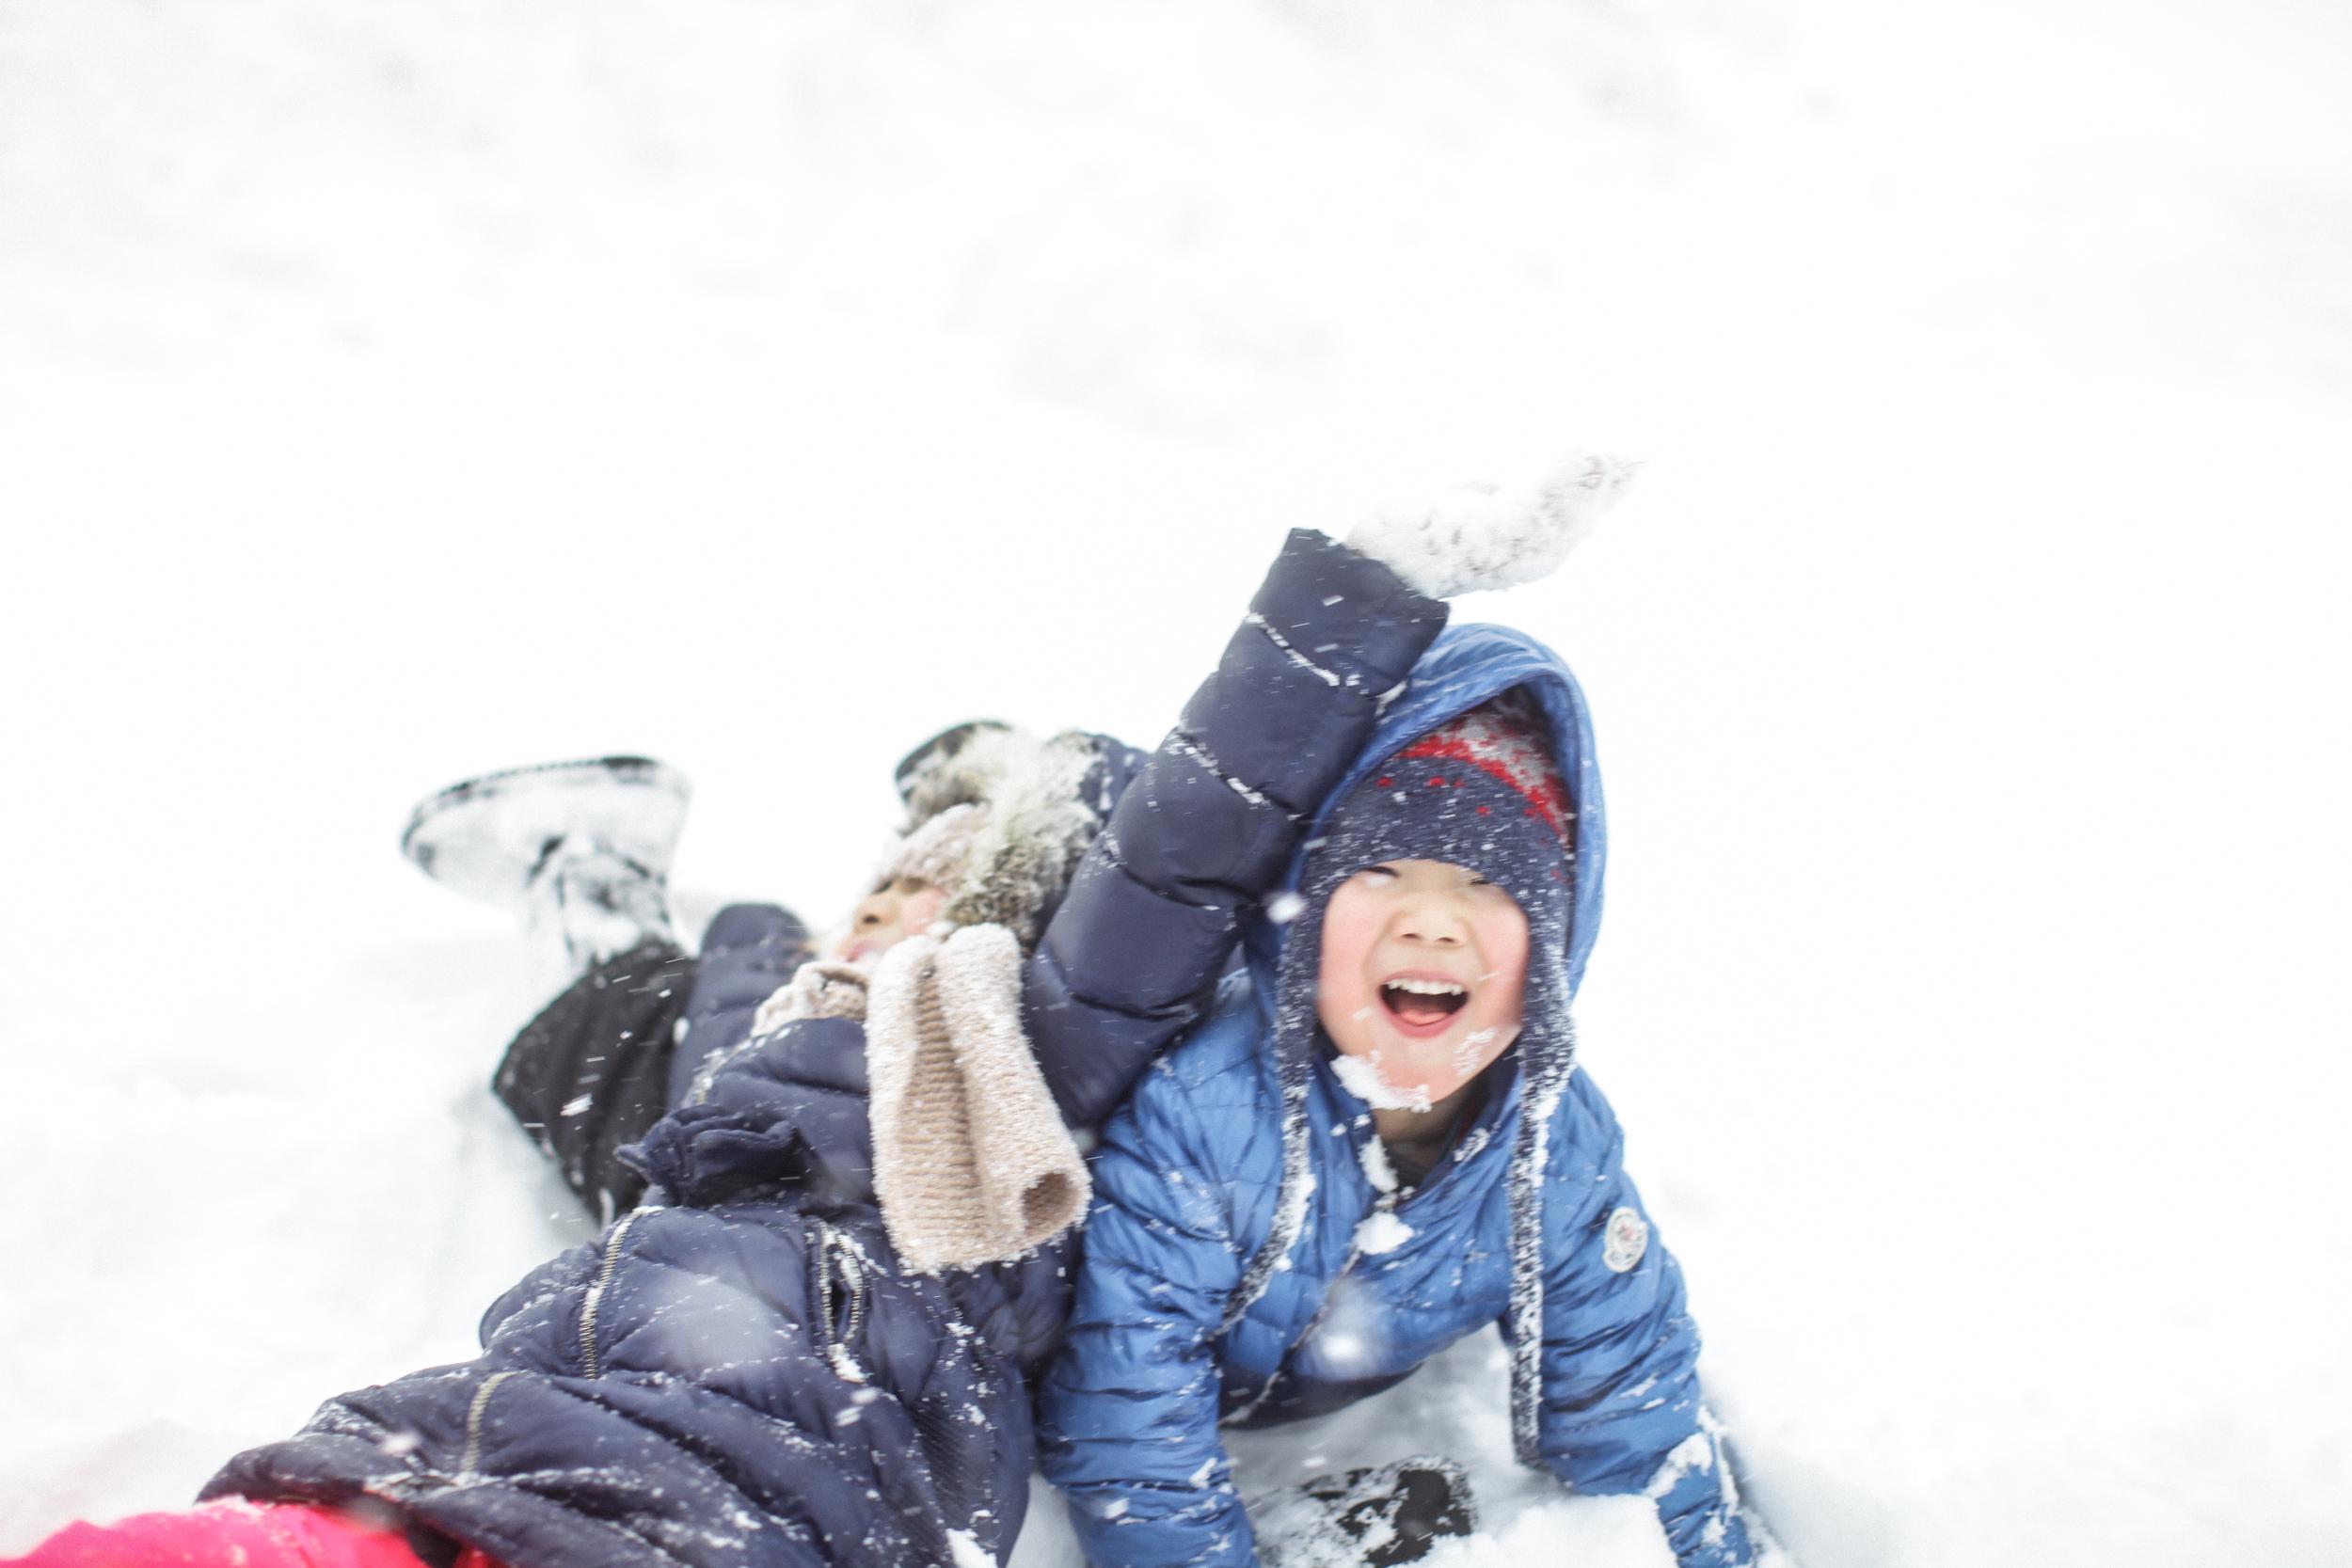 l deng chicago winterstrom blizzard millenium park snowball fight maggie daley ice ribbon -012.jpg